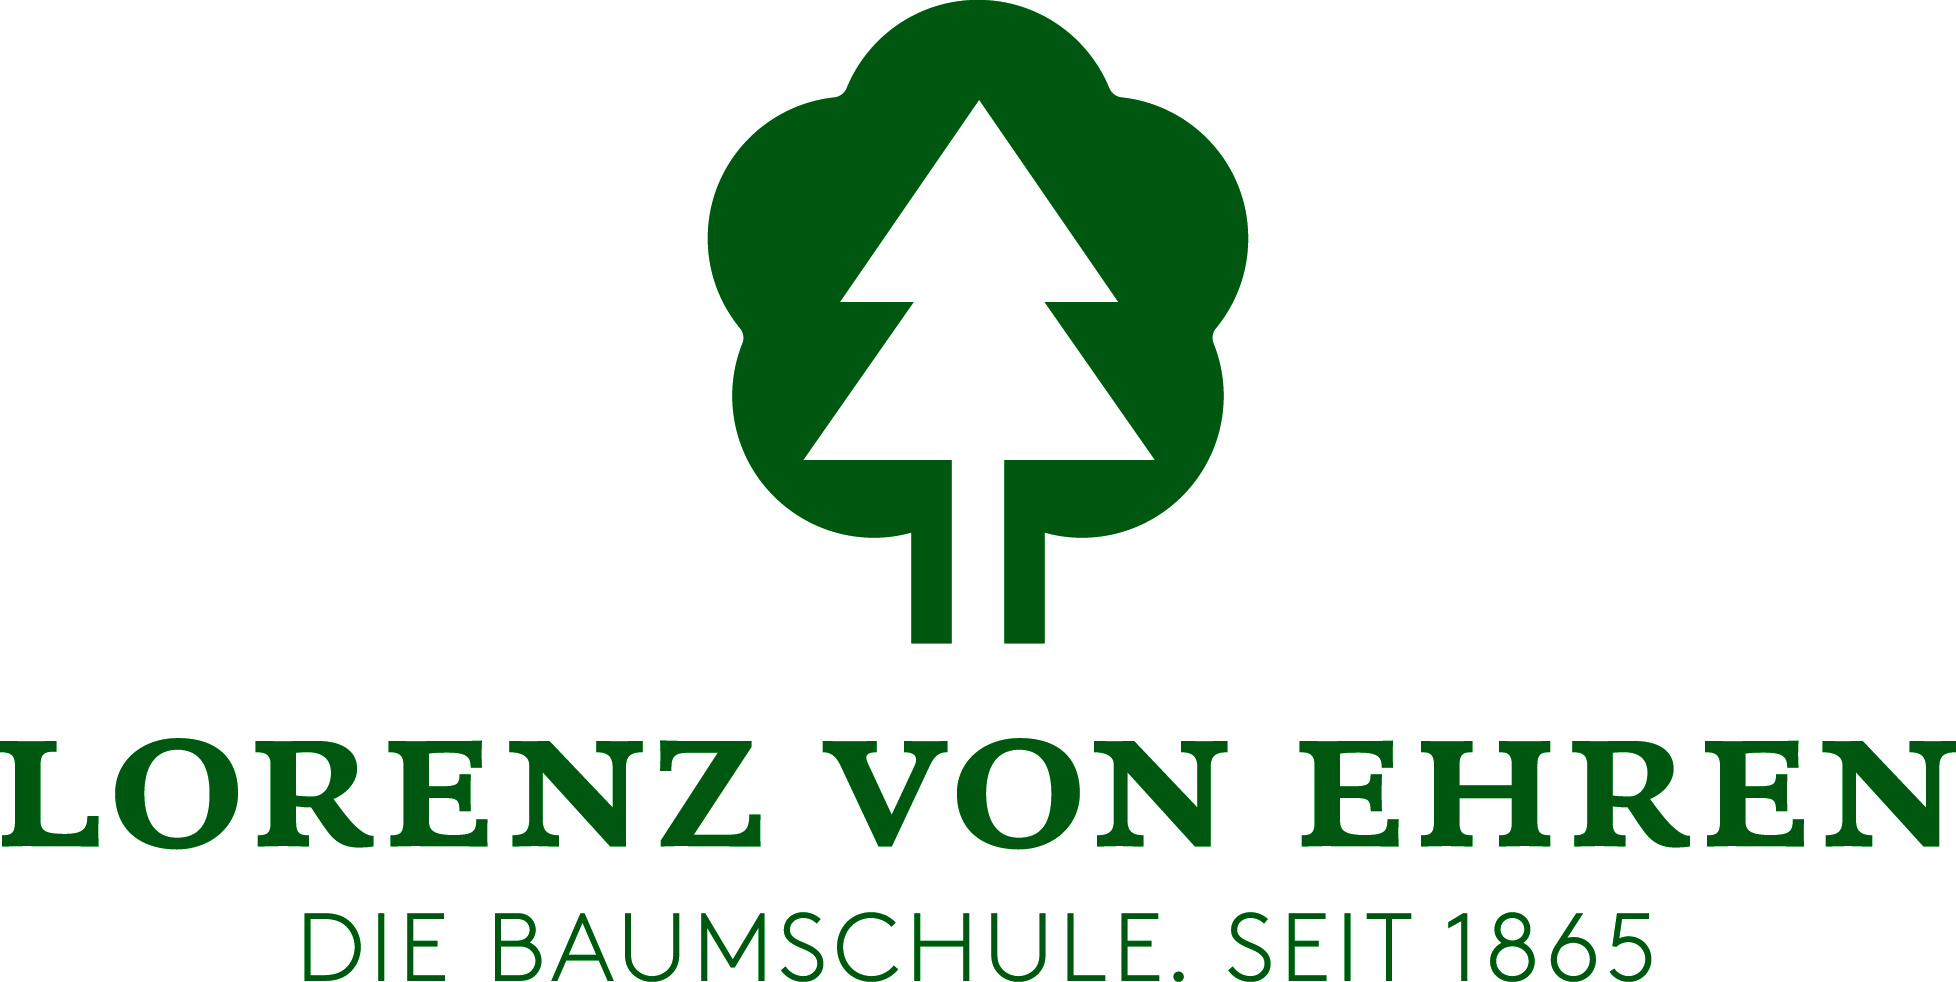 LvE_Logo_2014_300dpi_green